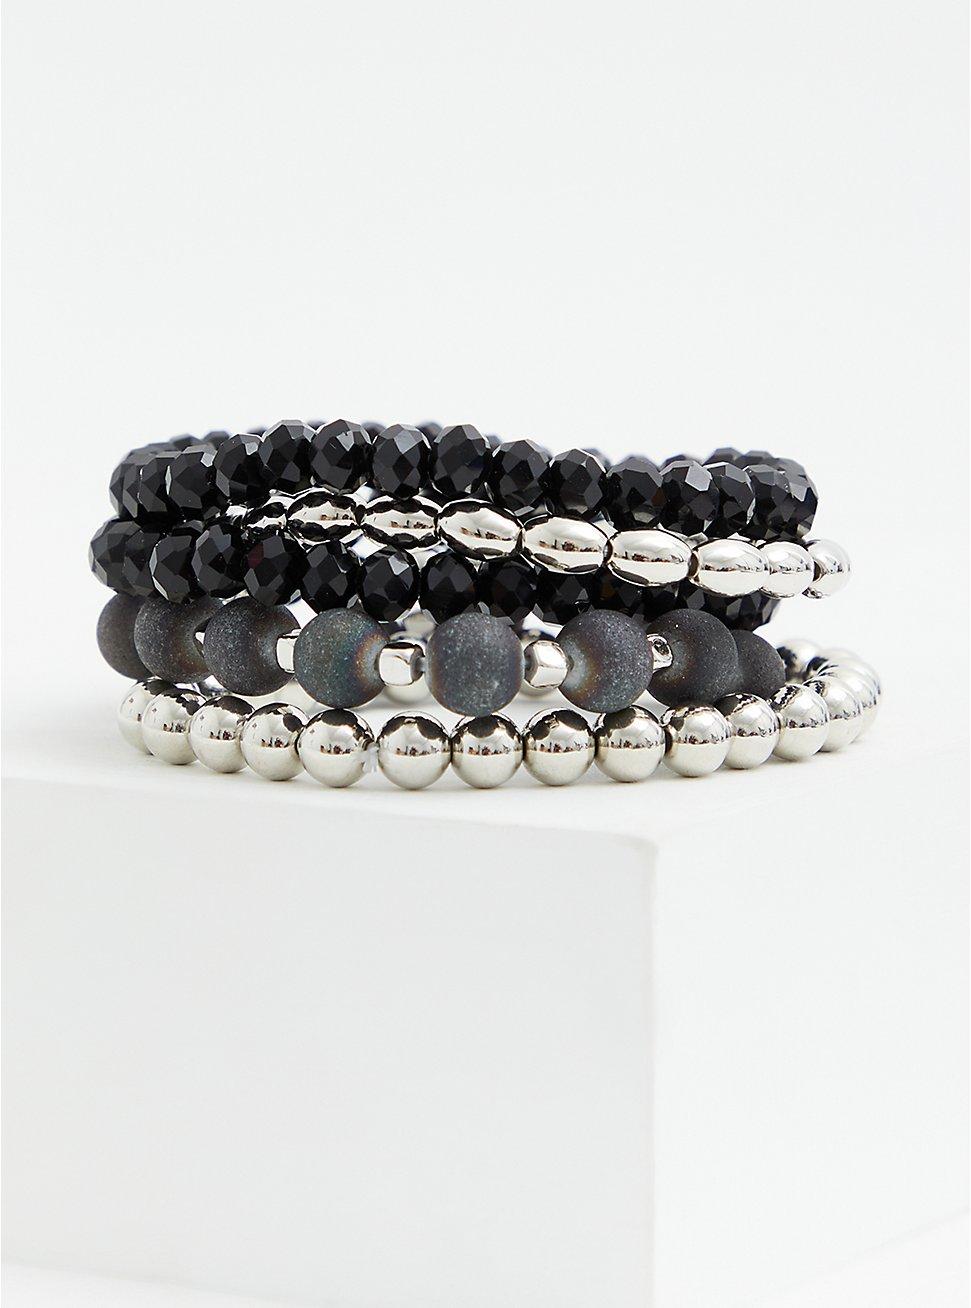 Black & Silver-Tone Stretch Bracelet Set - Set of 5, SILVER, hi-res